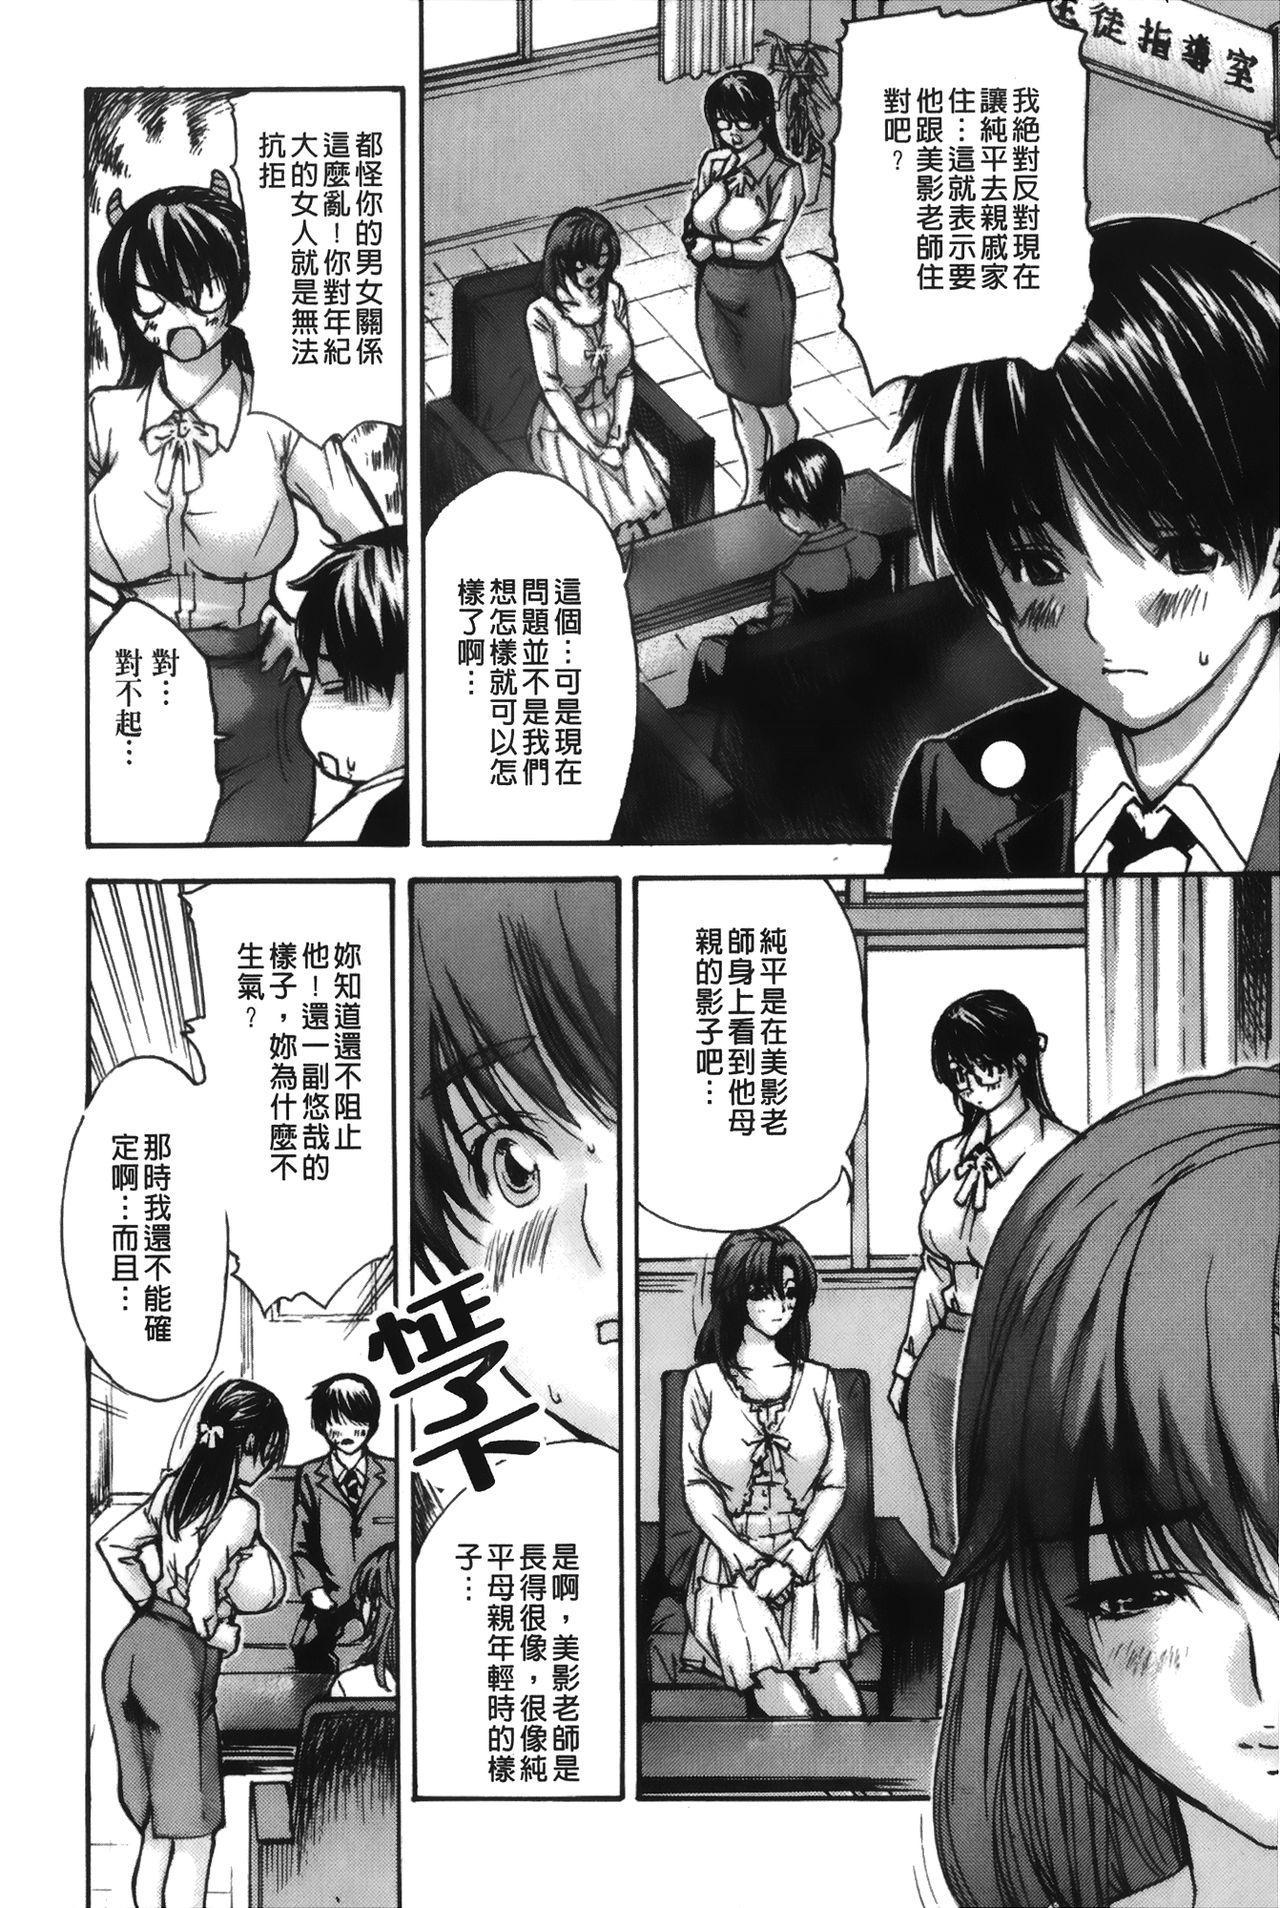 Tonari no Minano Sensei 4 | 隔壁的美奈乃老師 4 139